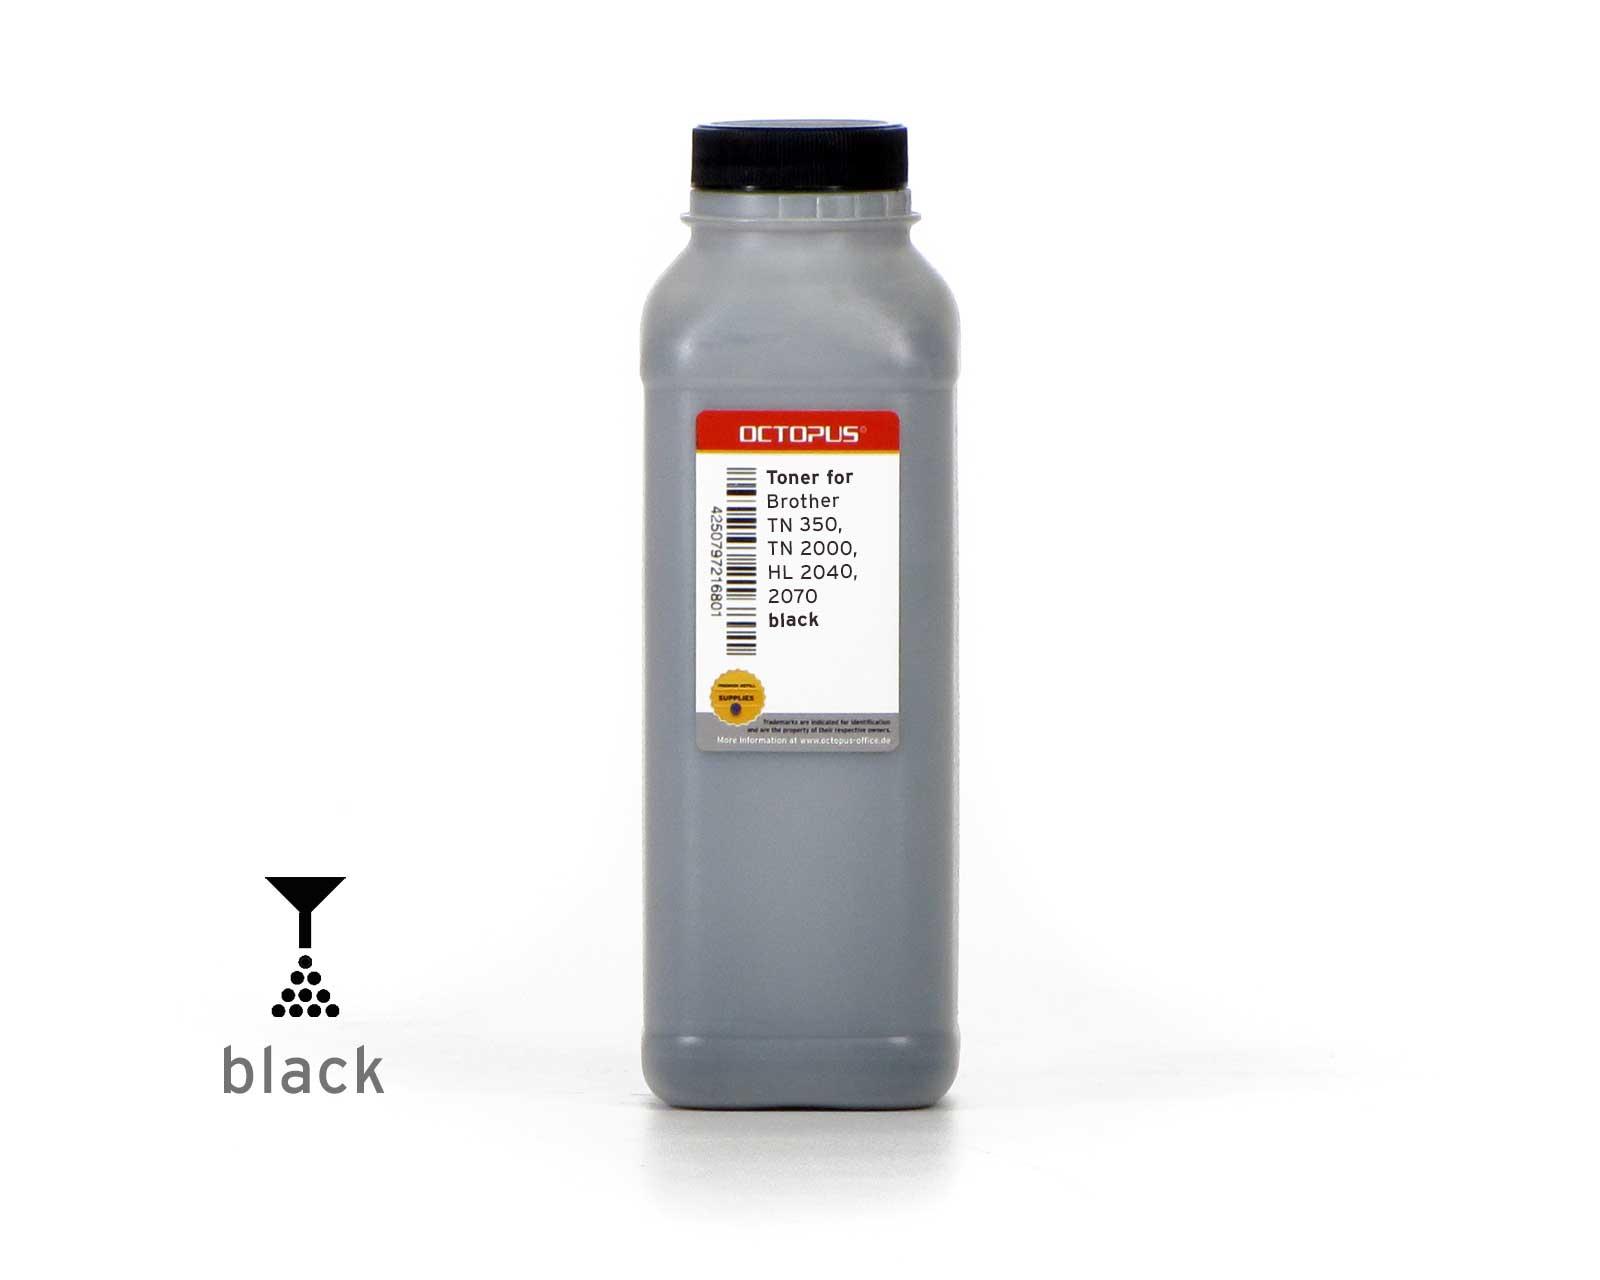 Toner powder , bulk toner for Brother TN 350, TN 2000, HL 2040, 2070 black